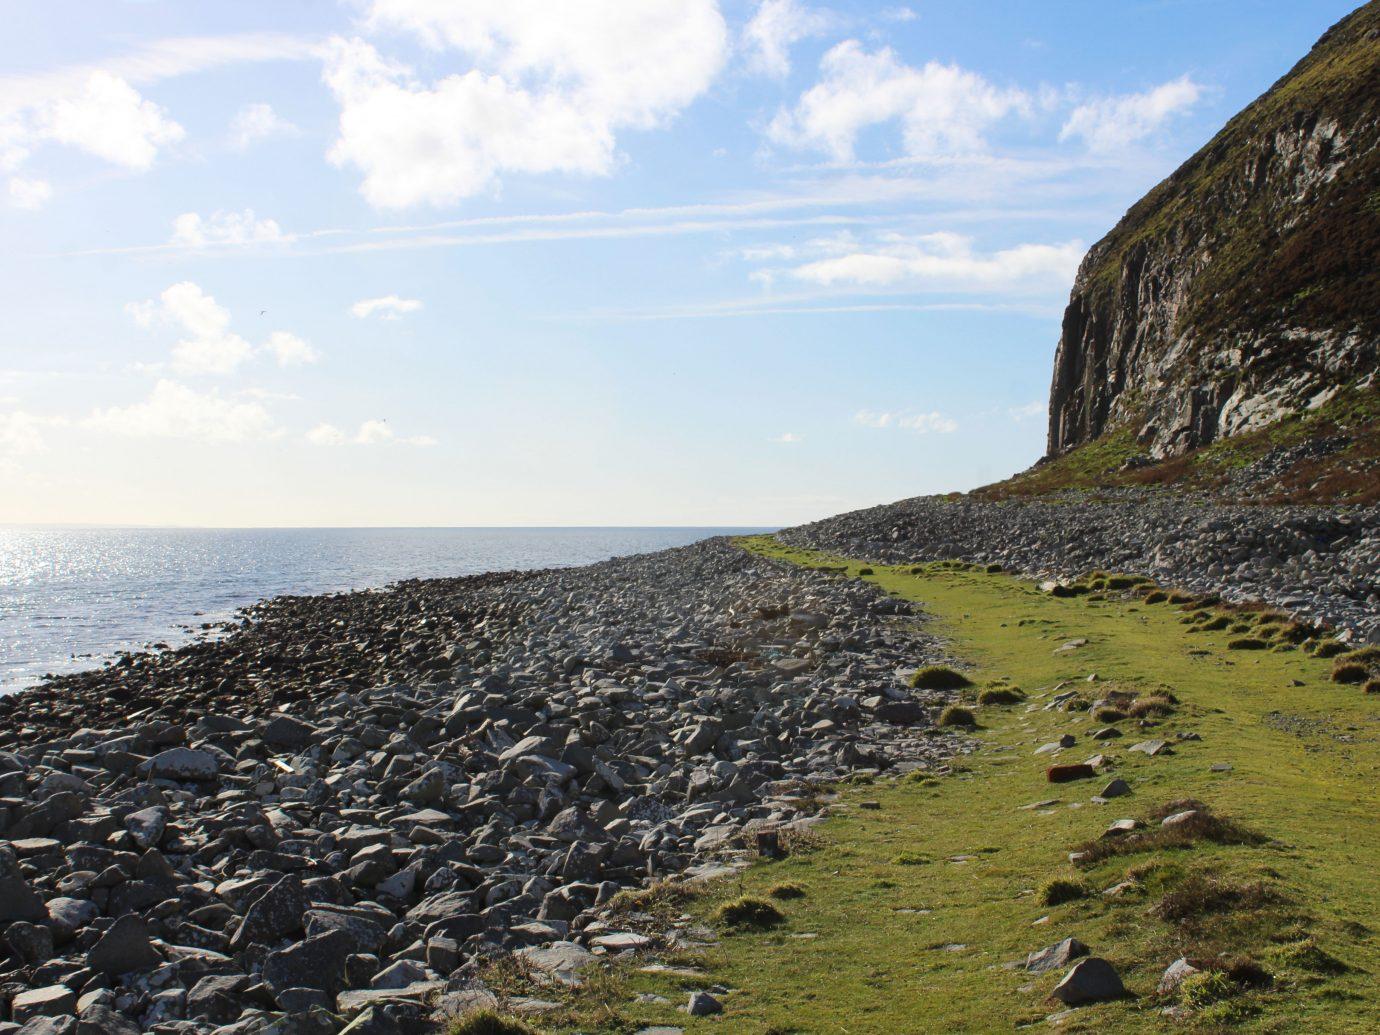 Ailsa Island in Scotland